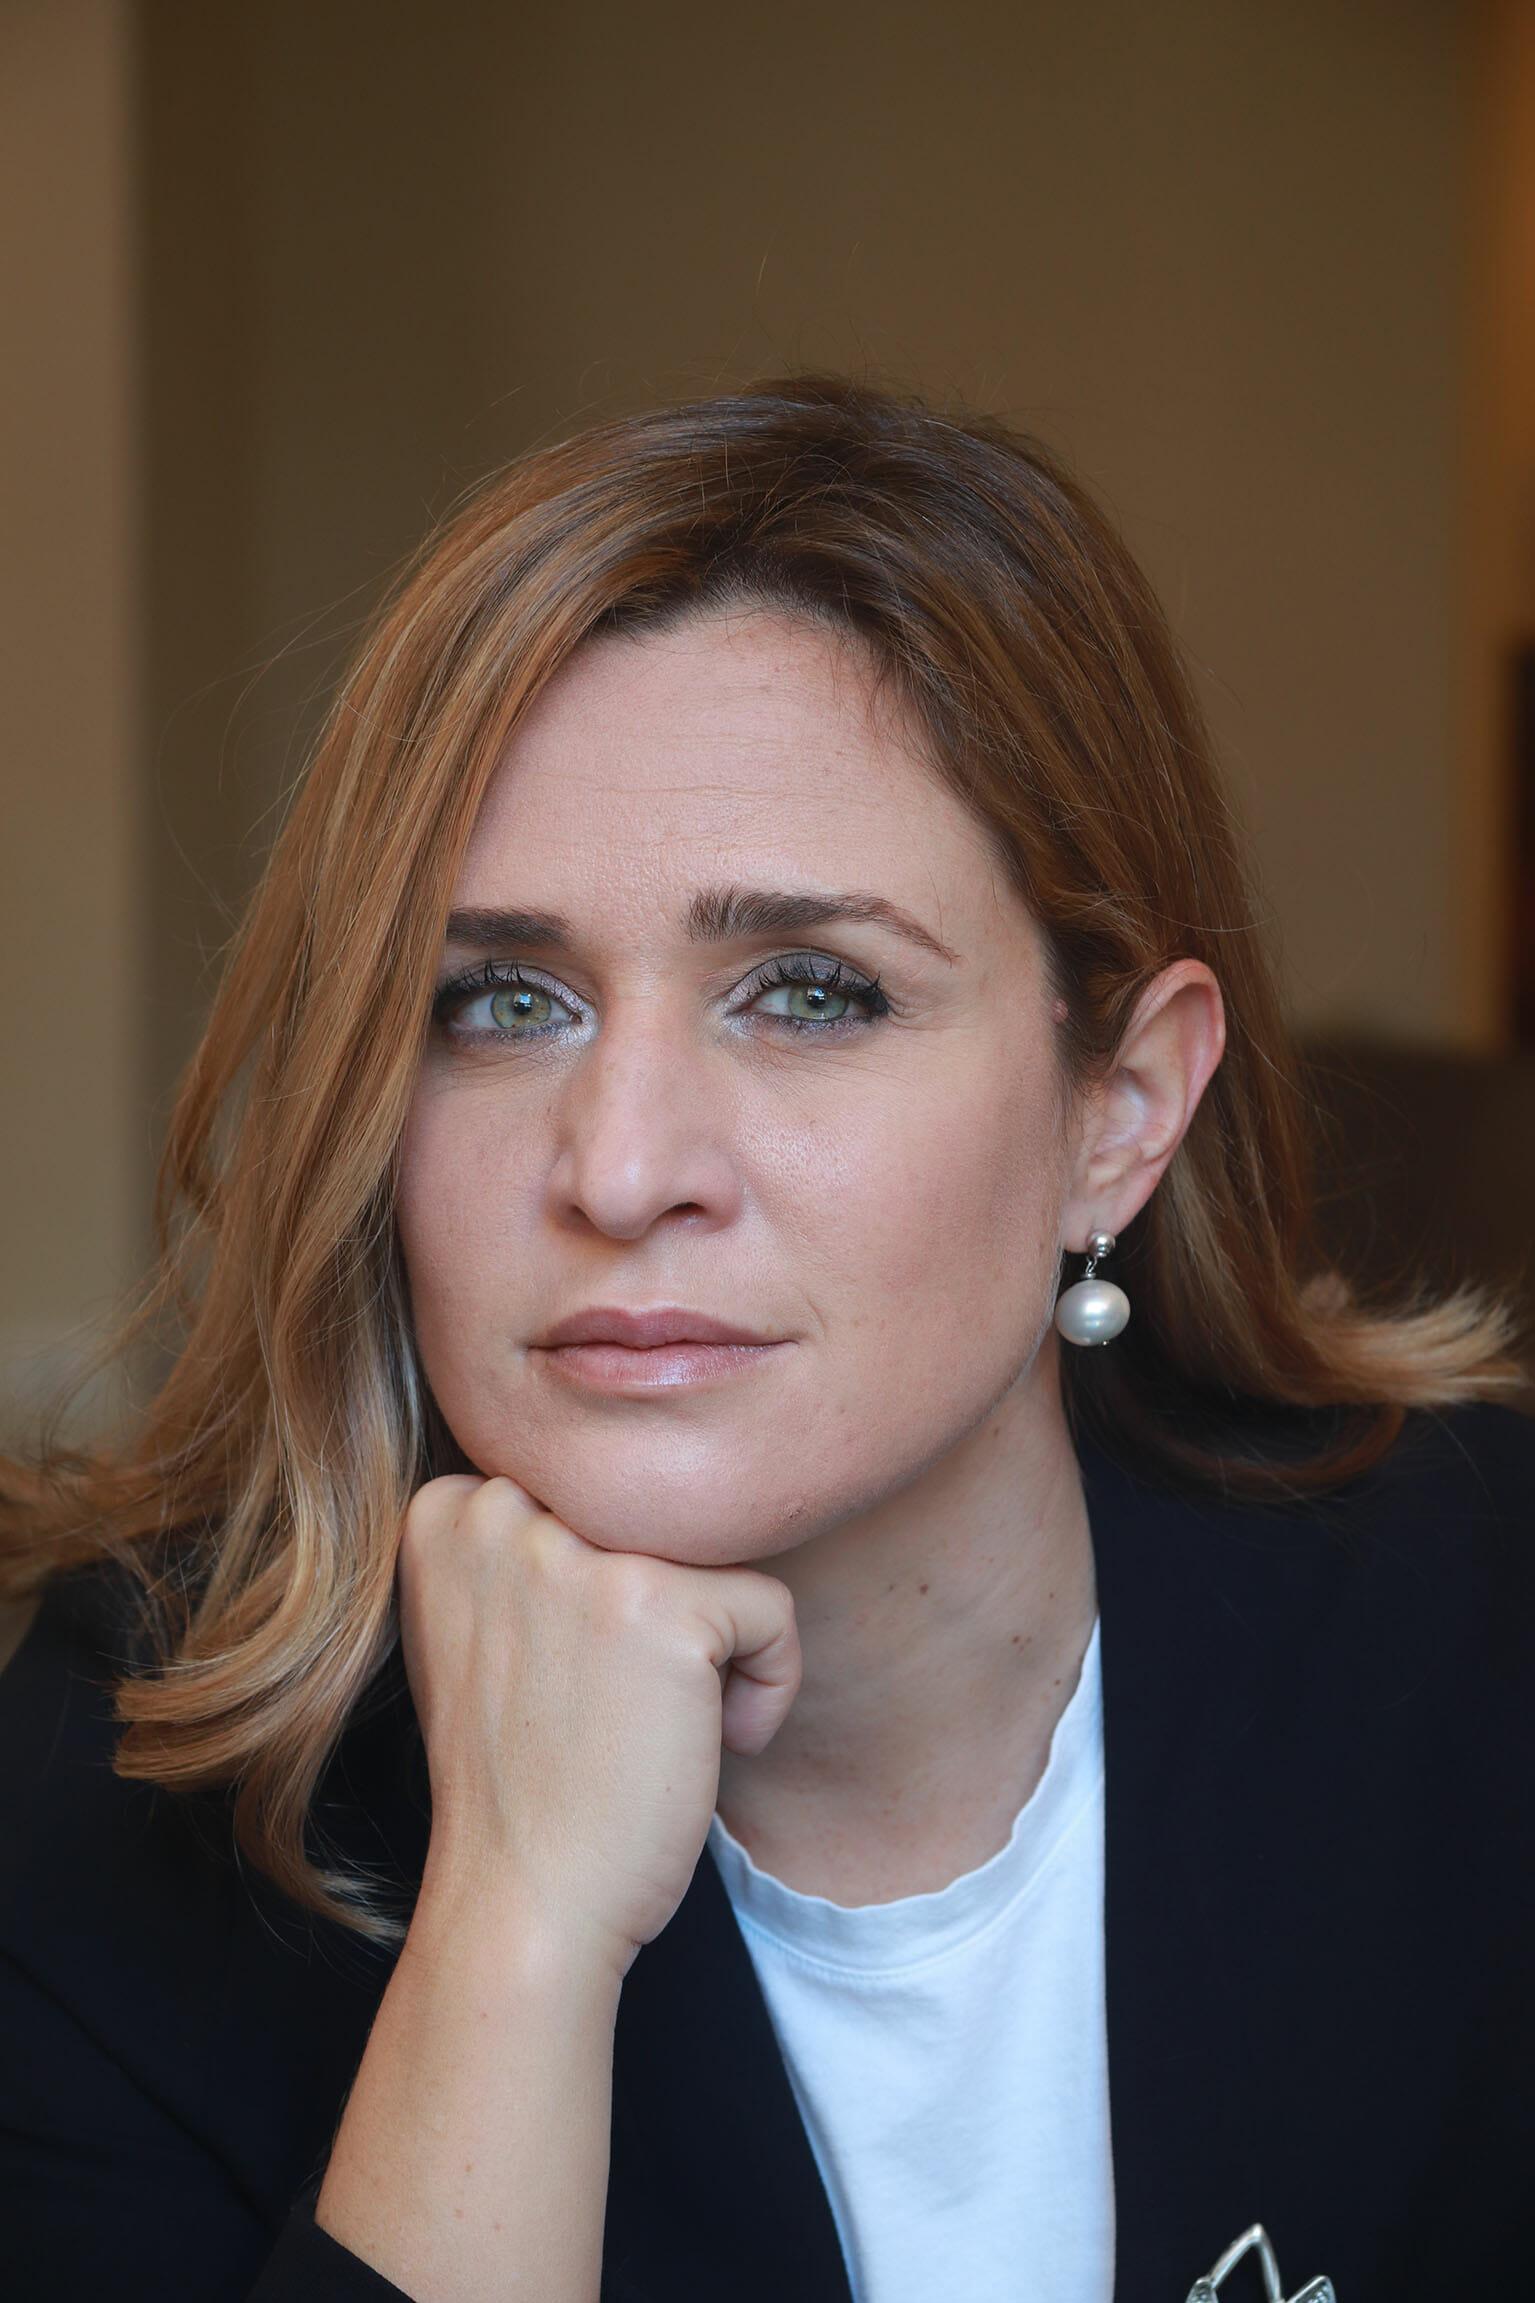 Giovanna  Pancheri - credit 2020 Giliola CHISTE